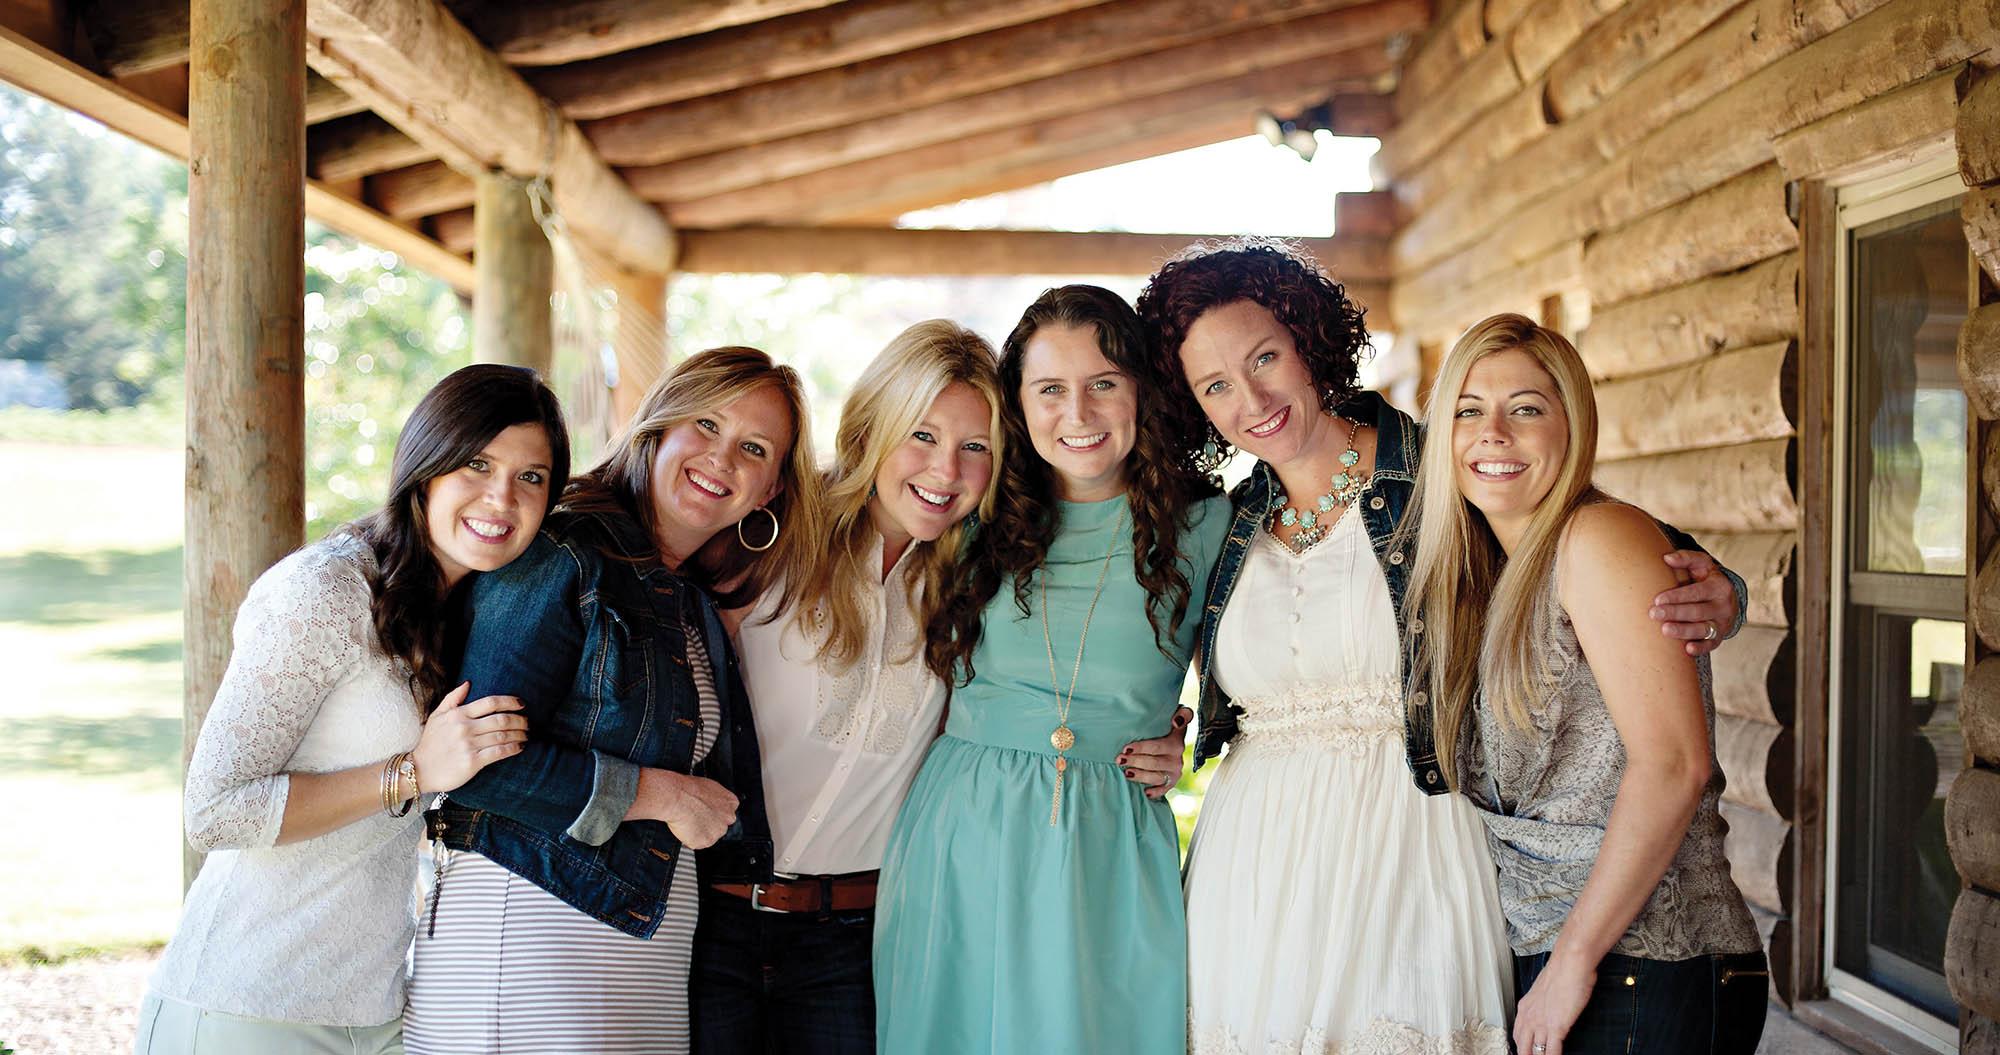 The Inspire Weddings & Marriage team